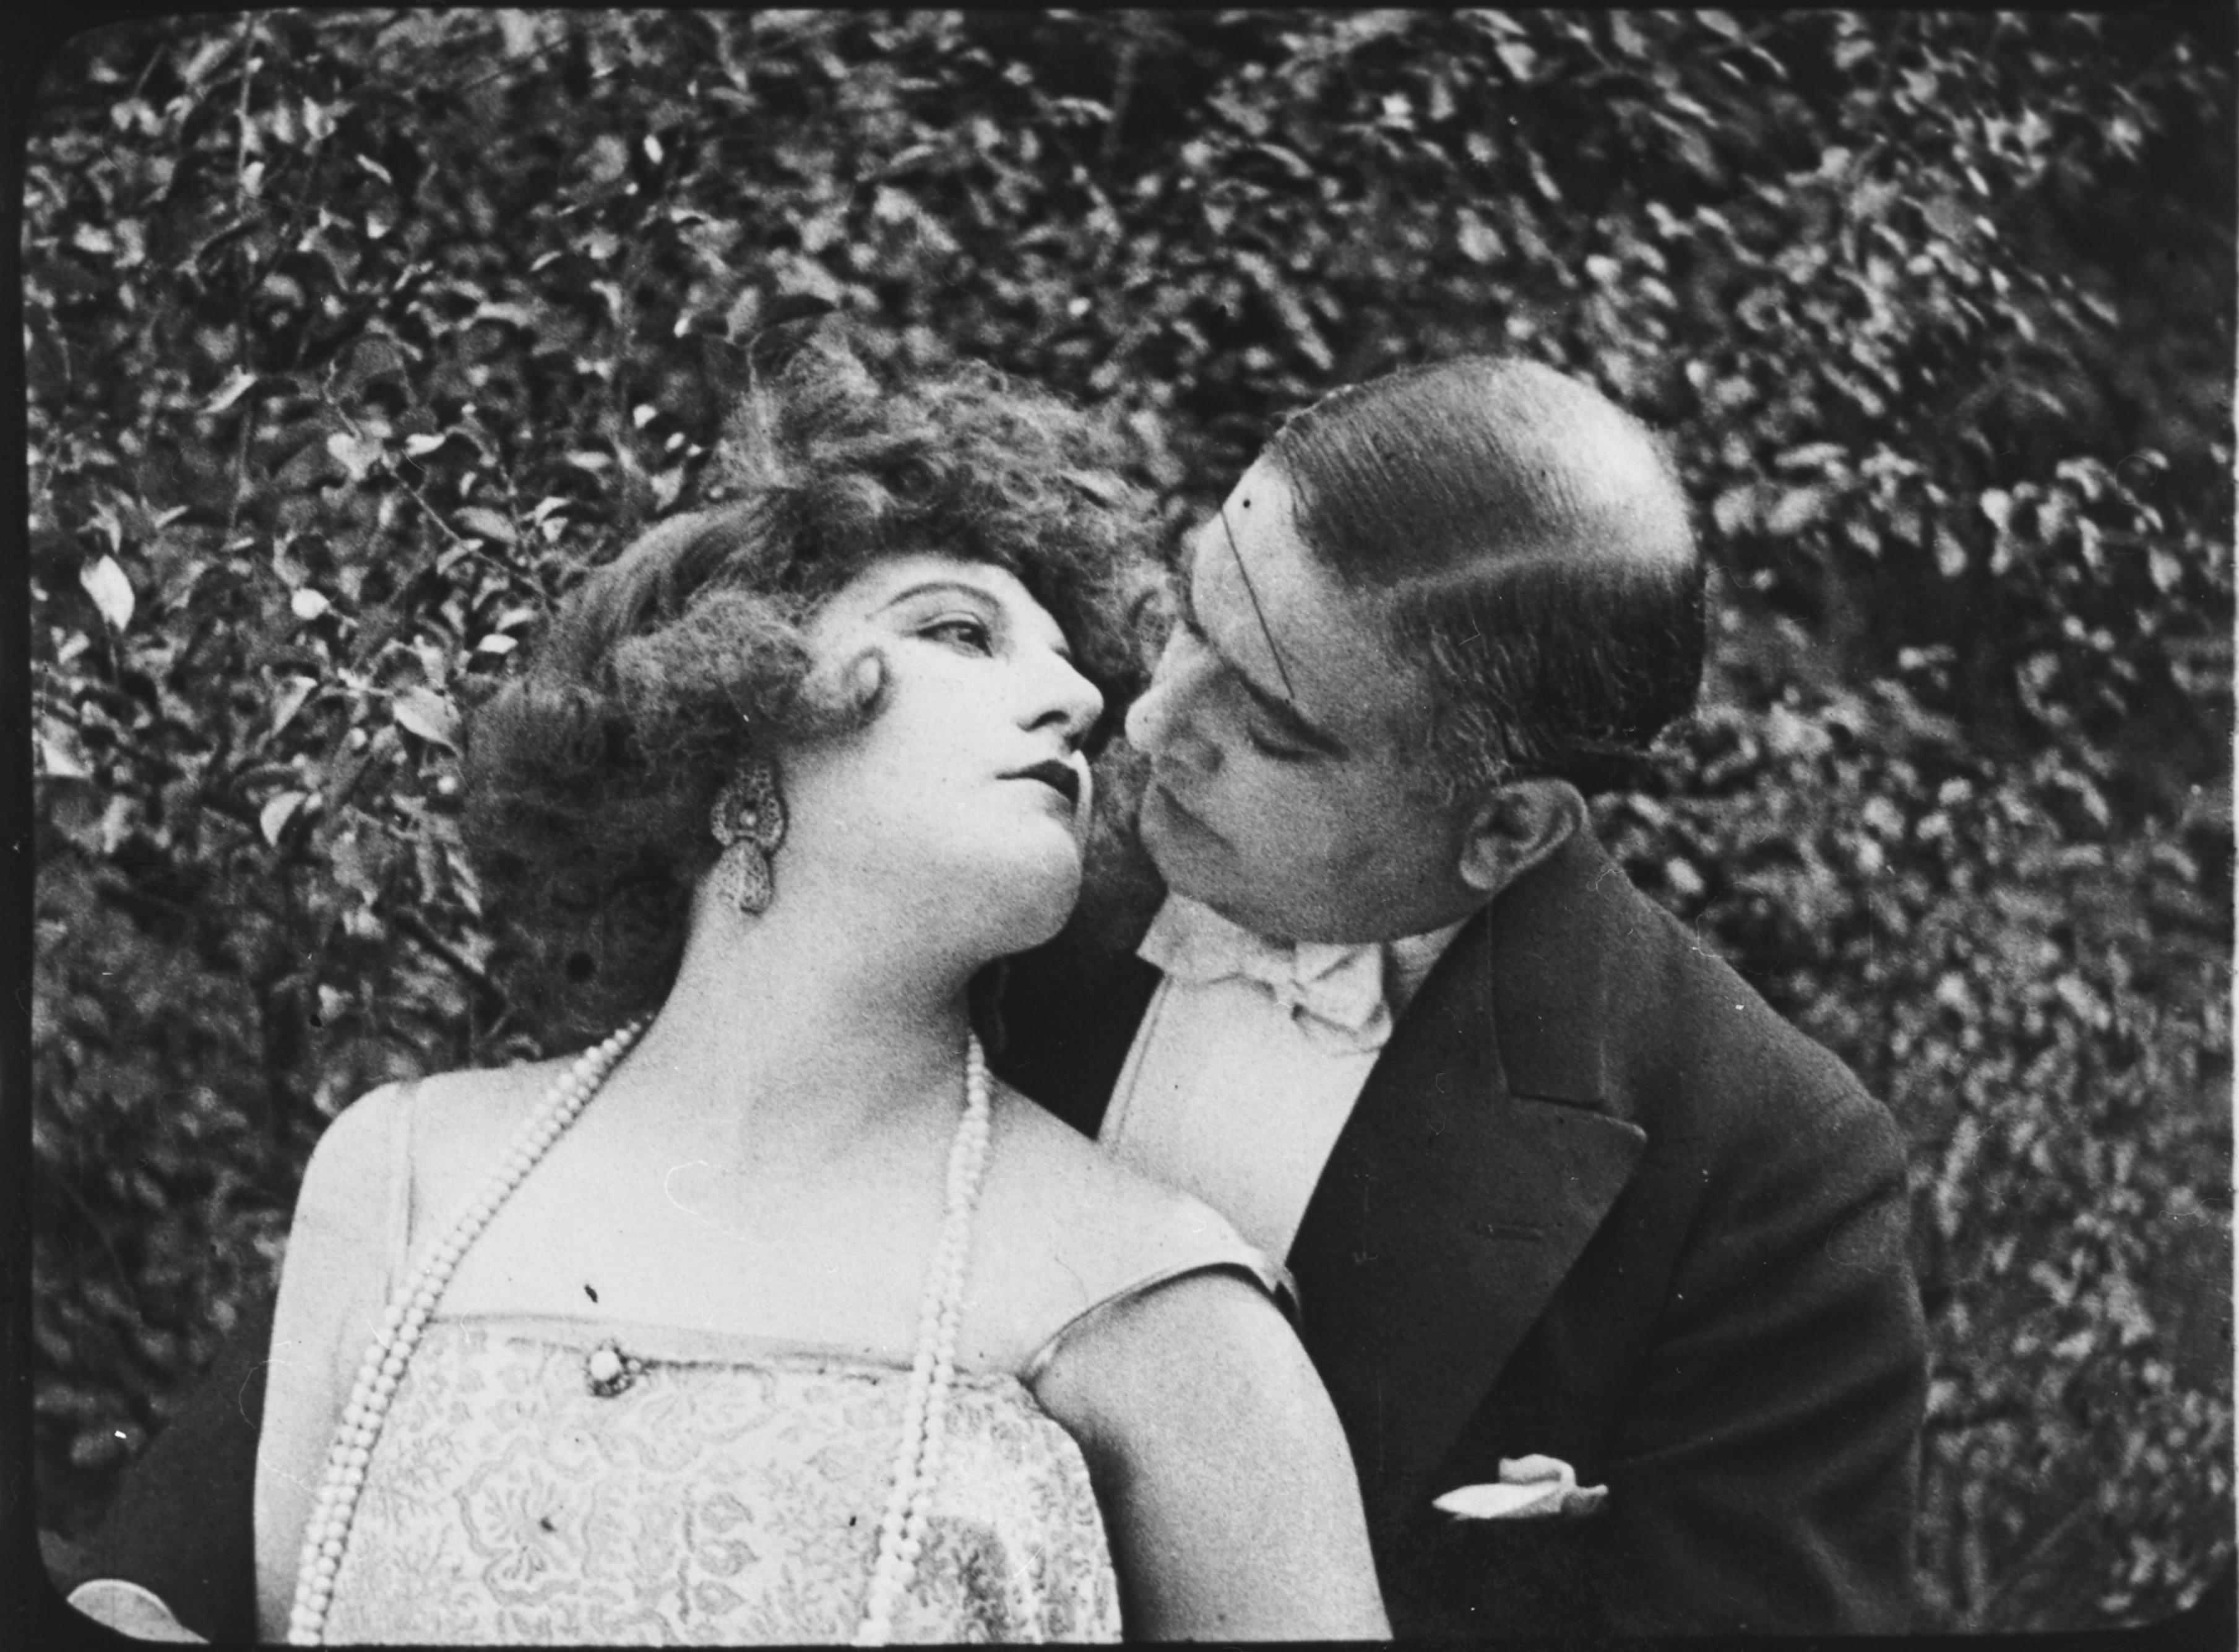 La belle dame sans merci (1920)